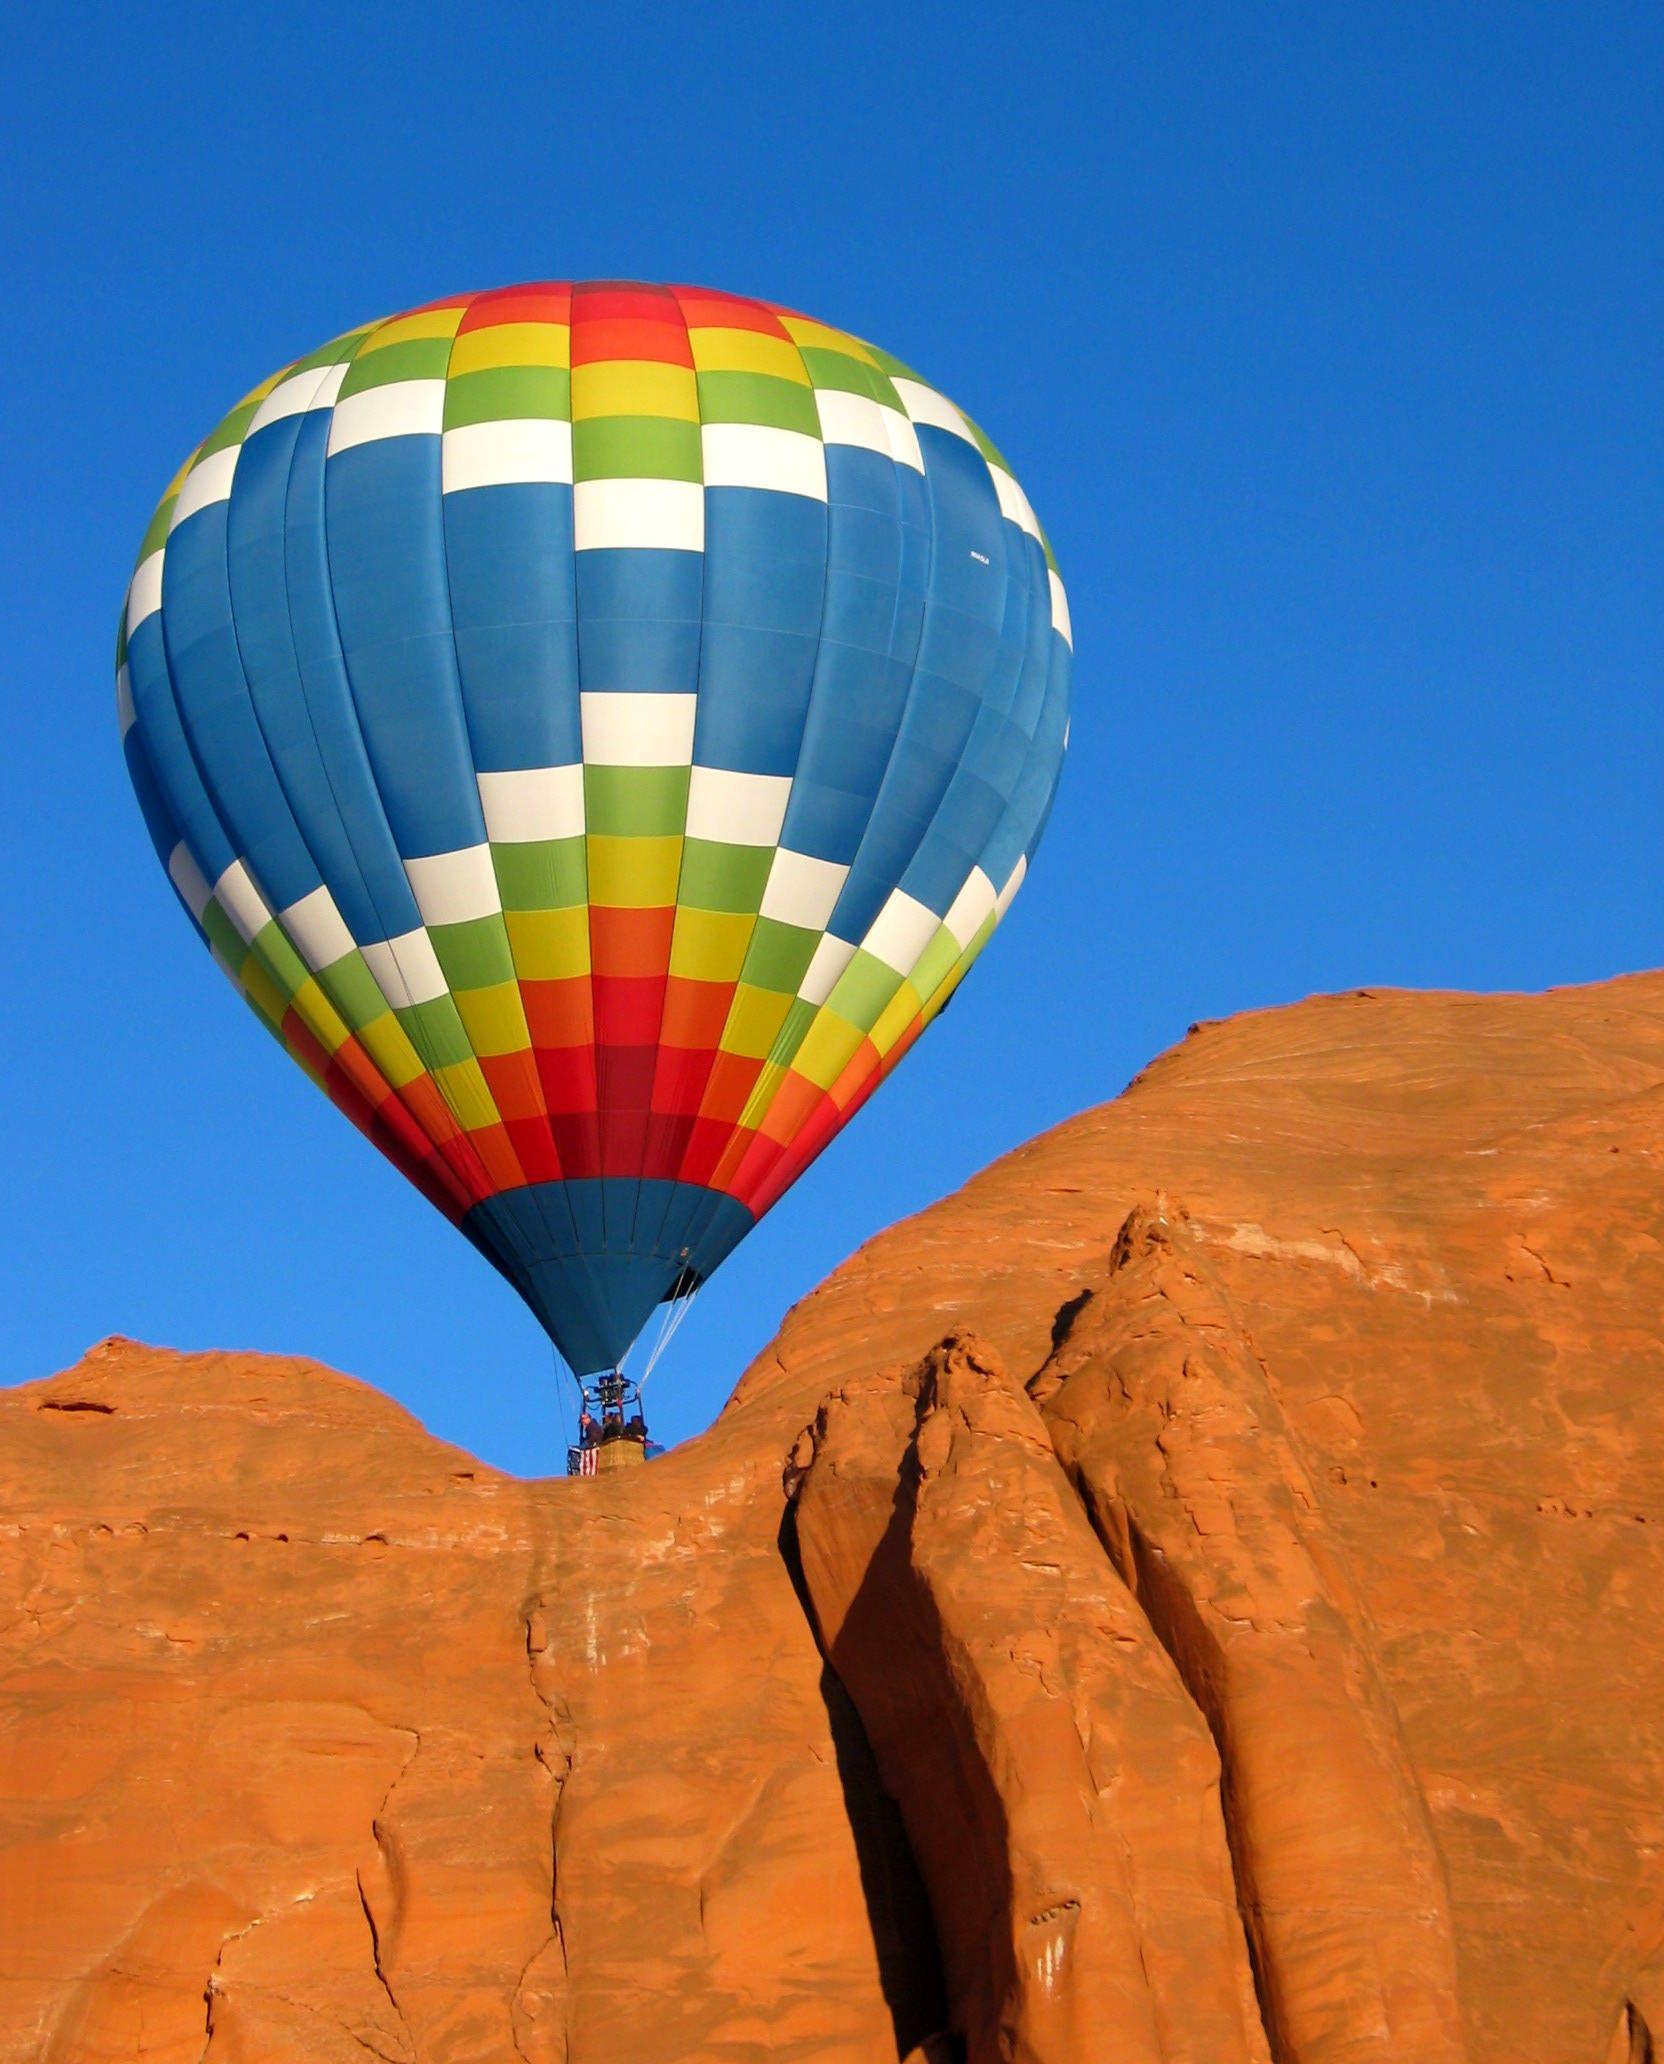 How to See the Albuquerque International Balloon Fiesta